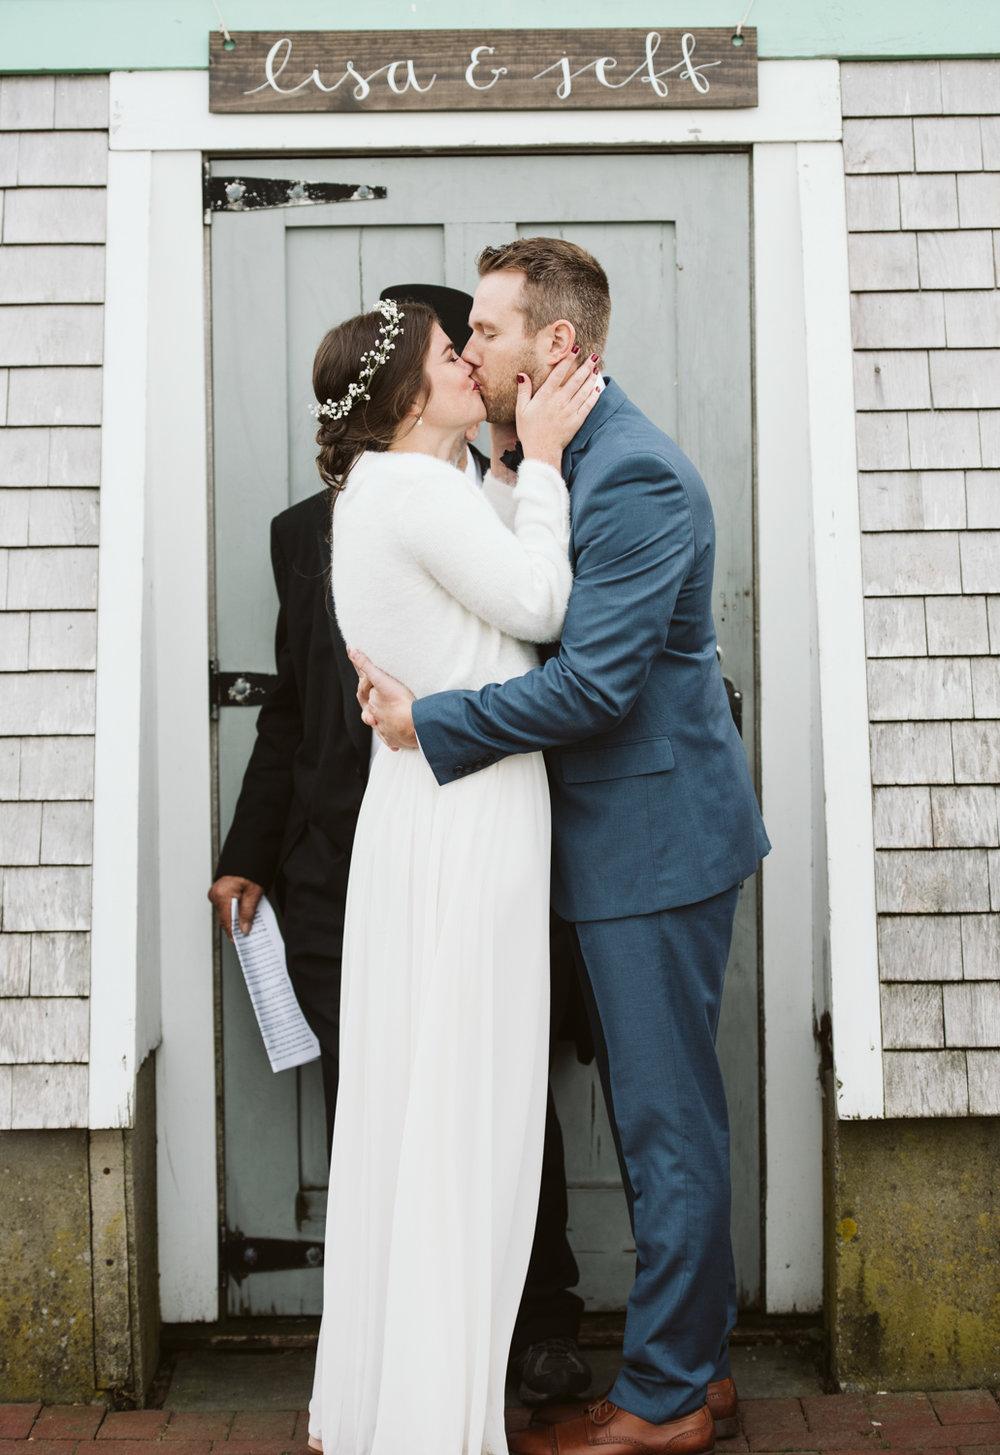 wedding_ocean_park_marthas_vineyardDSC_1840.jpg